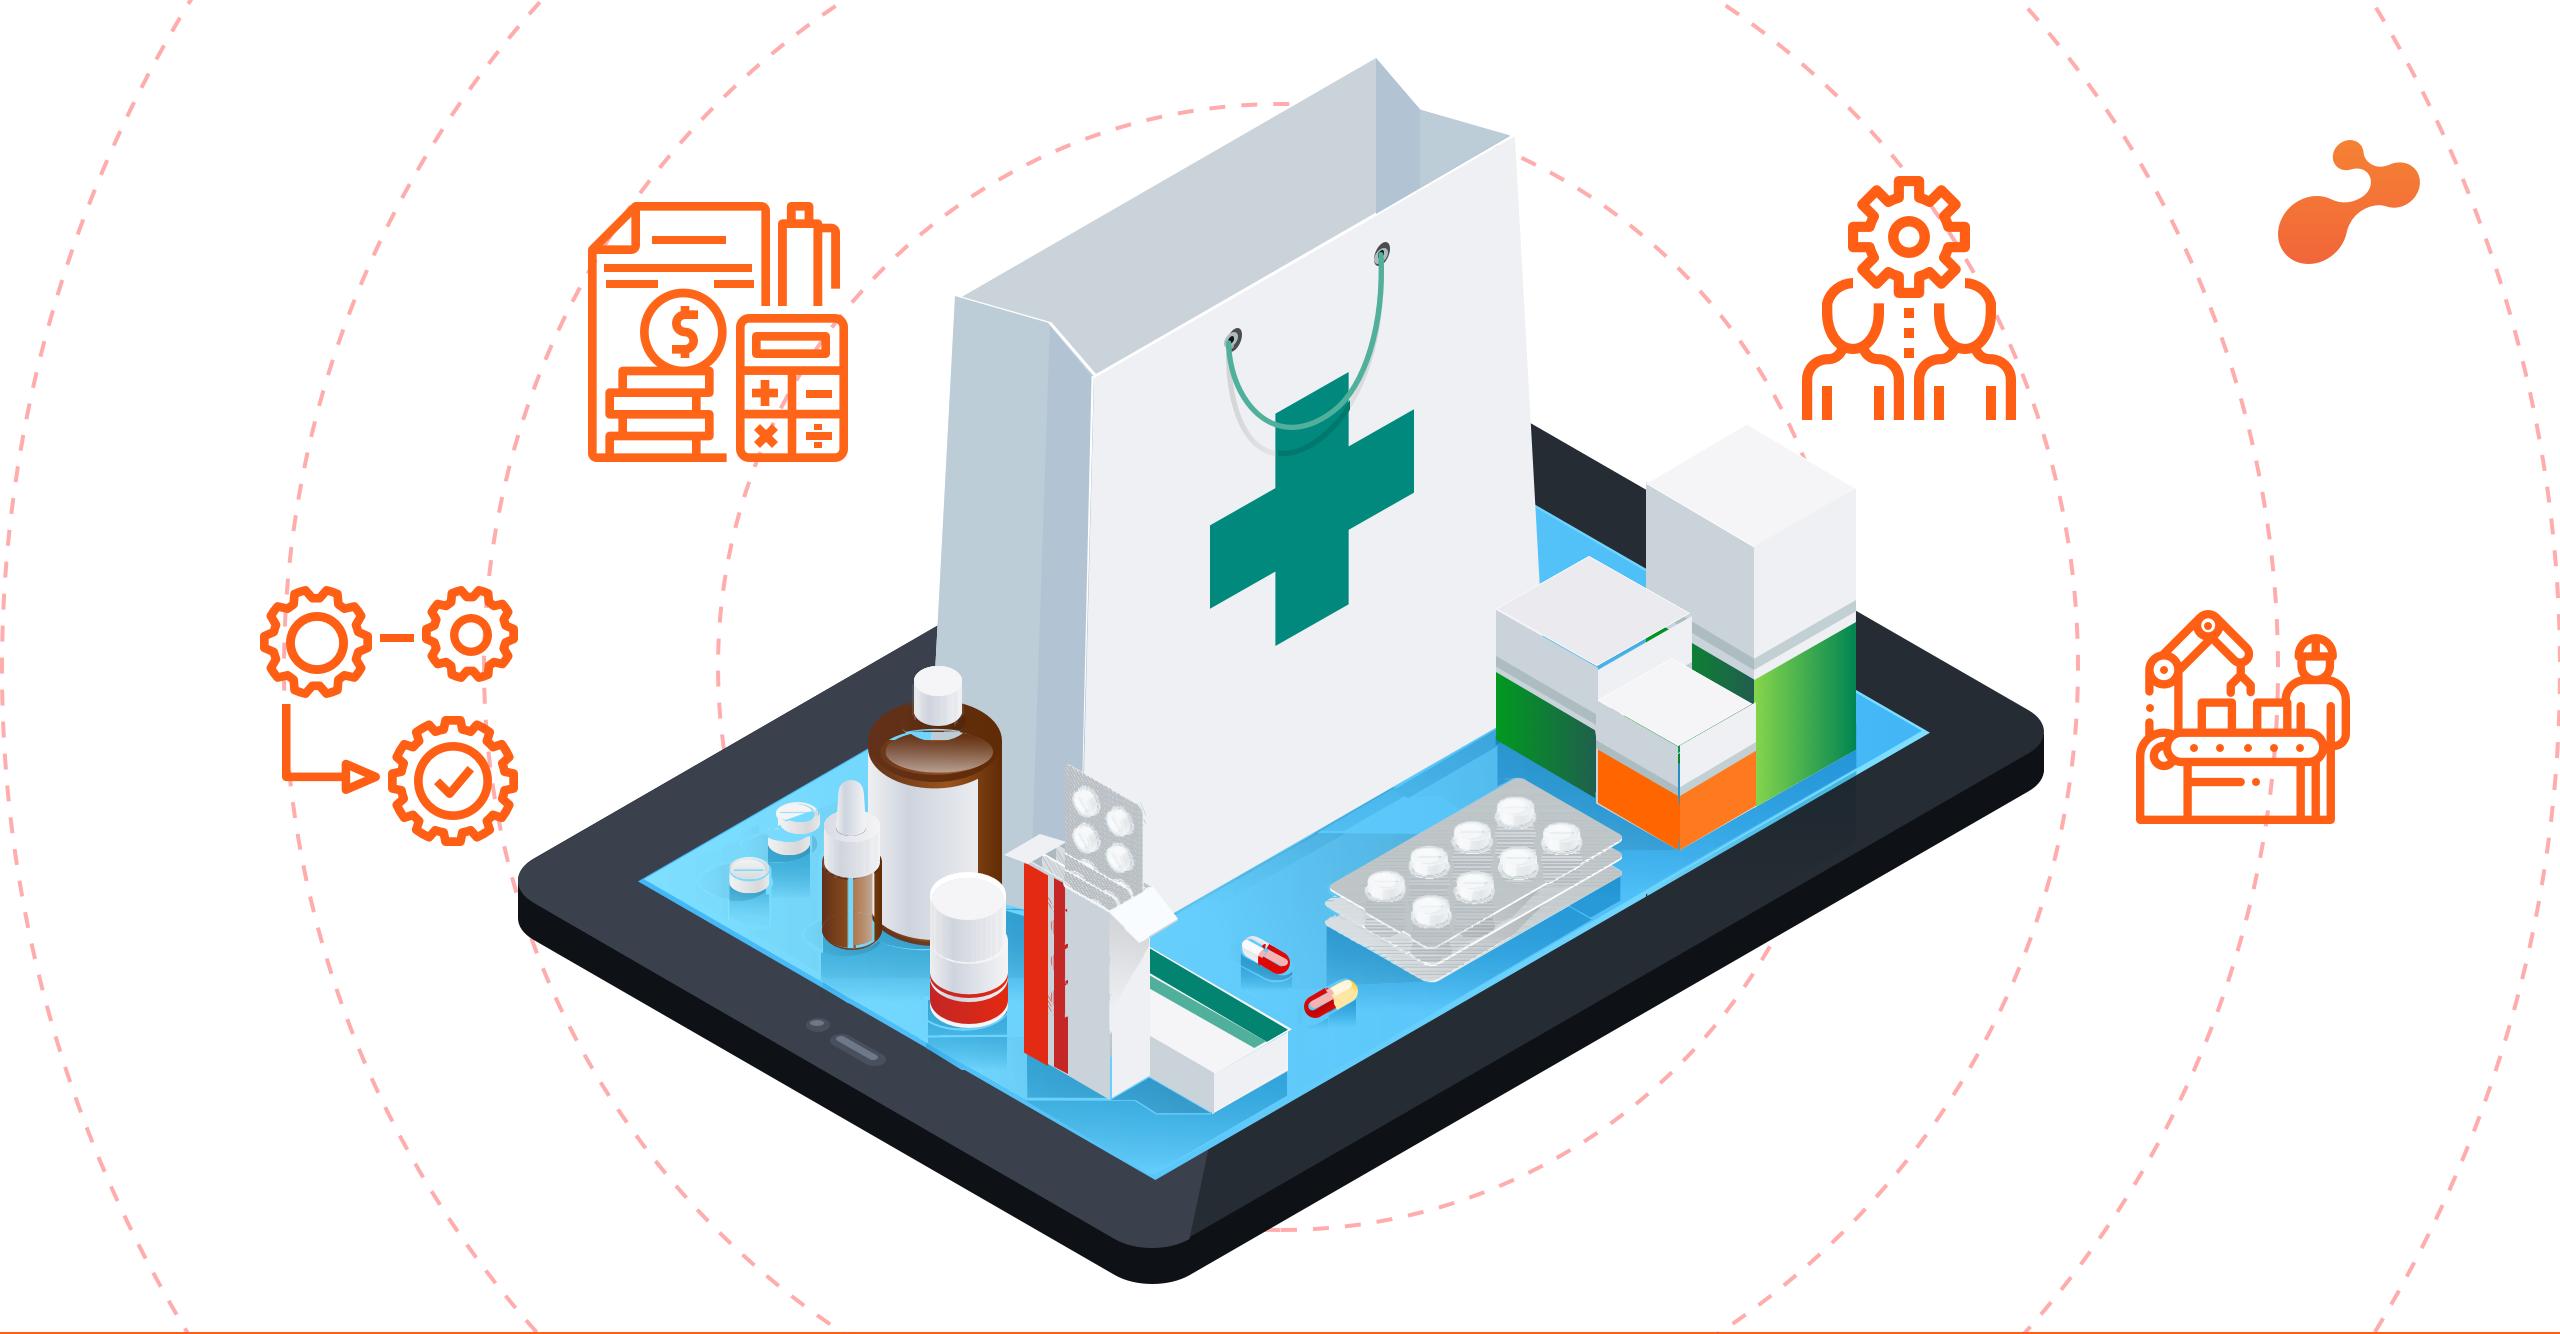 Digital Transformation opportunity within PBM (Pharmacy Benefit Management)